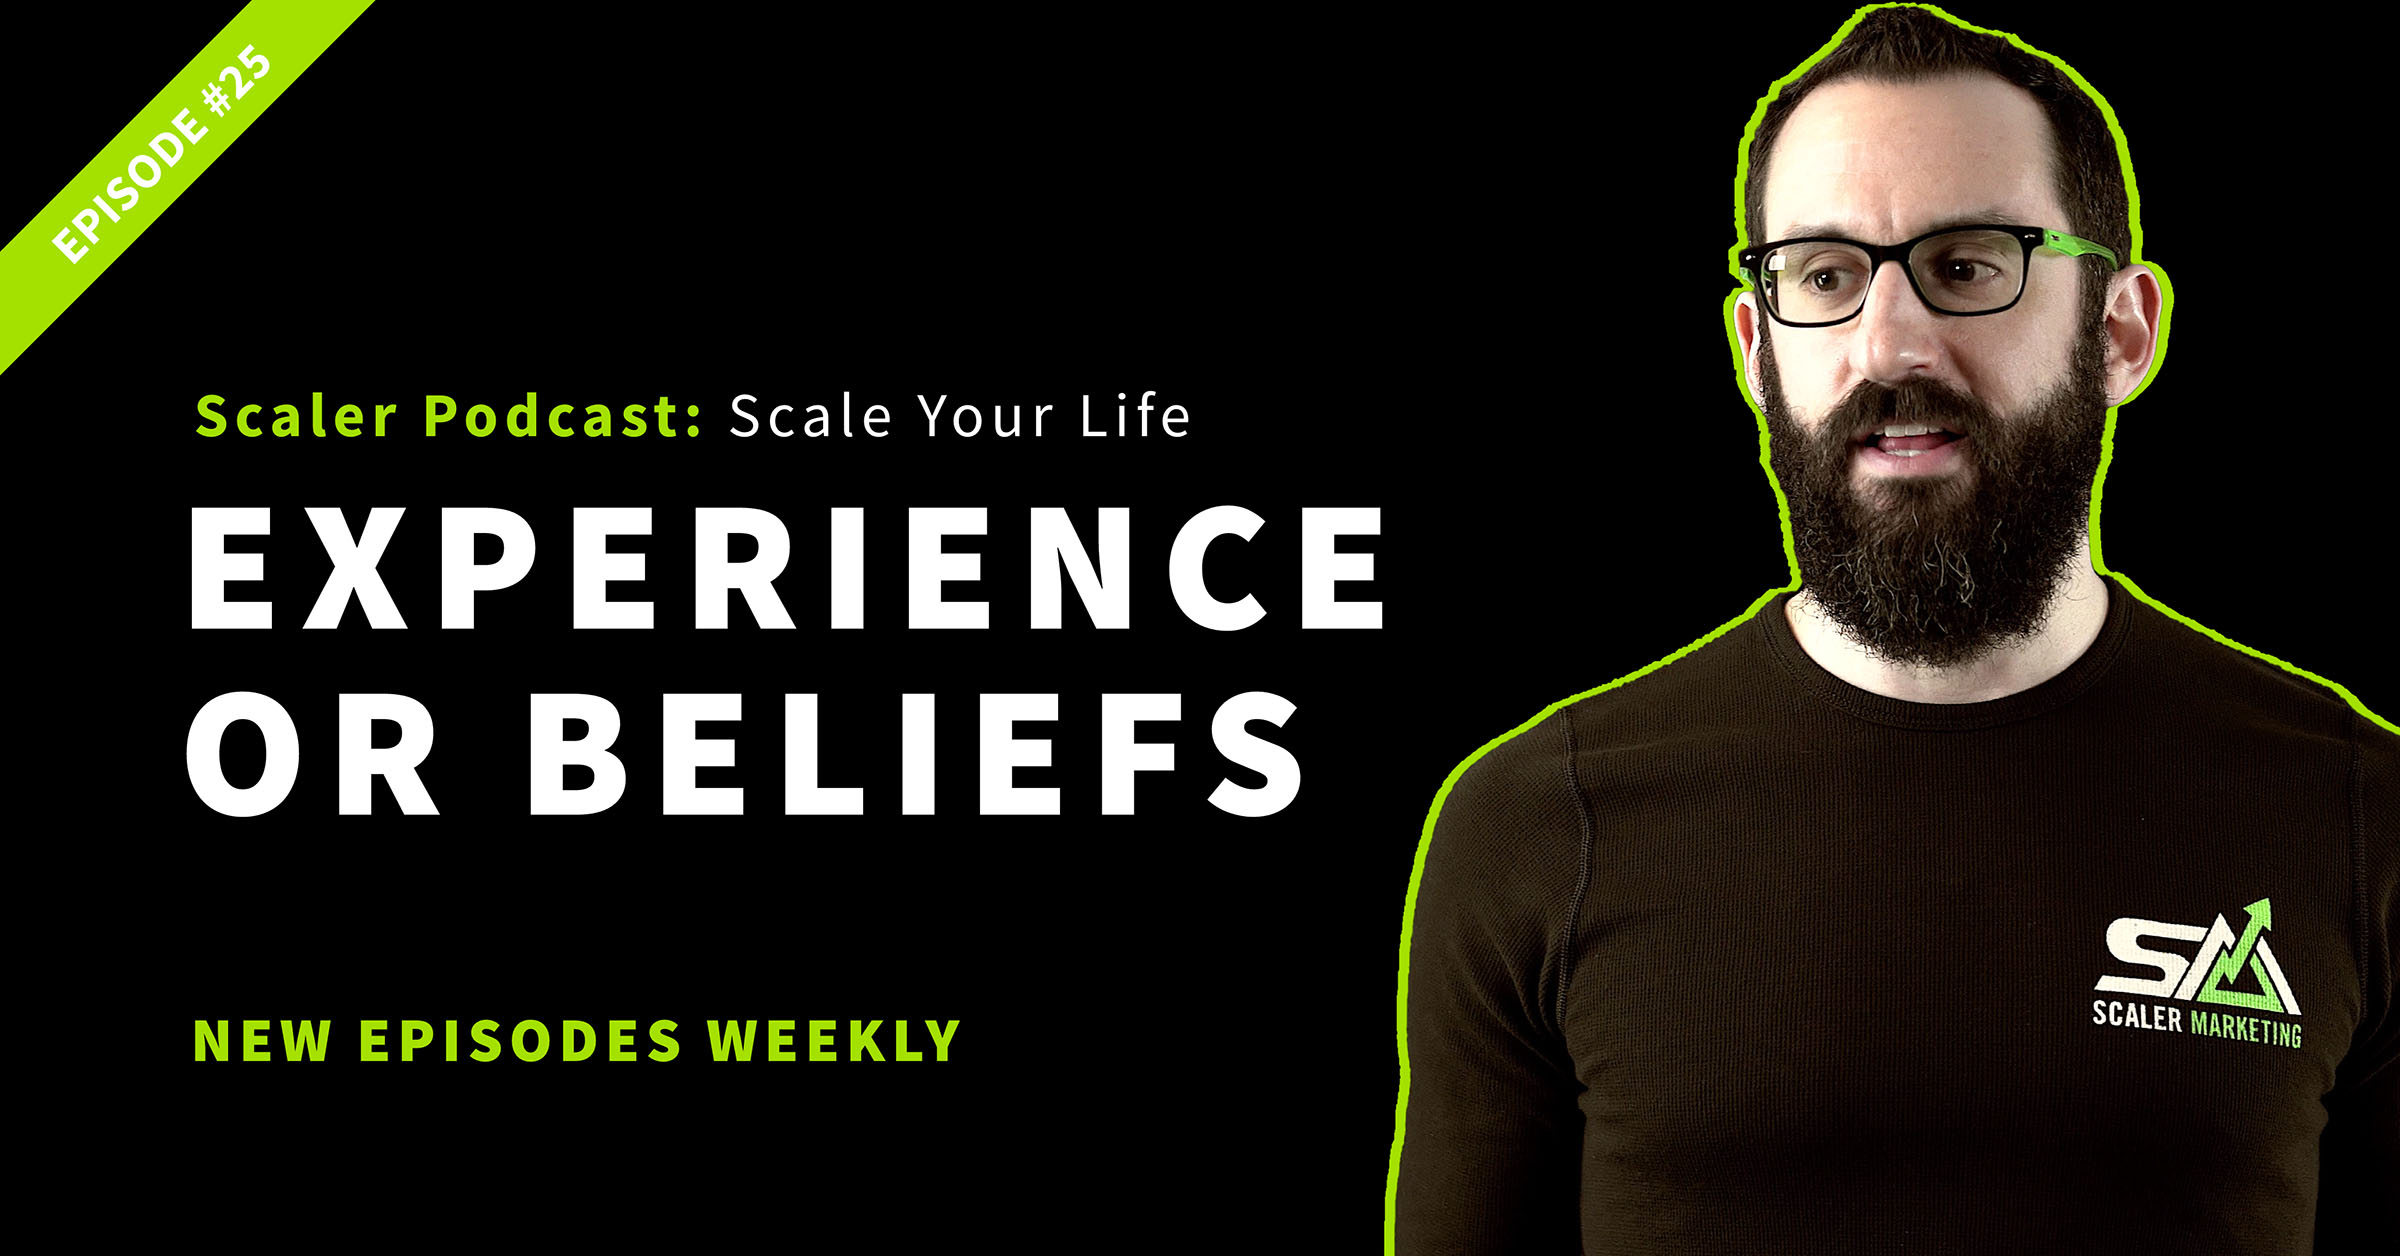 Episode 25 - Experience or Beliefs